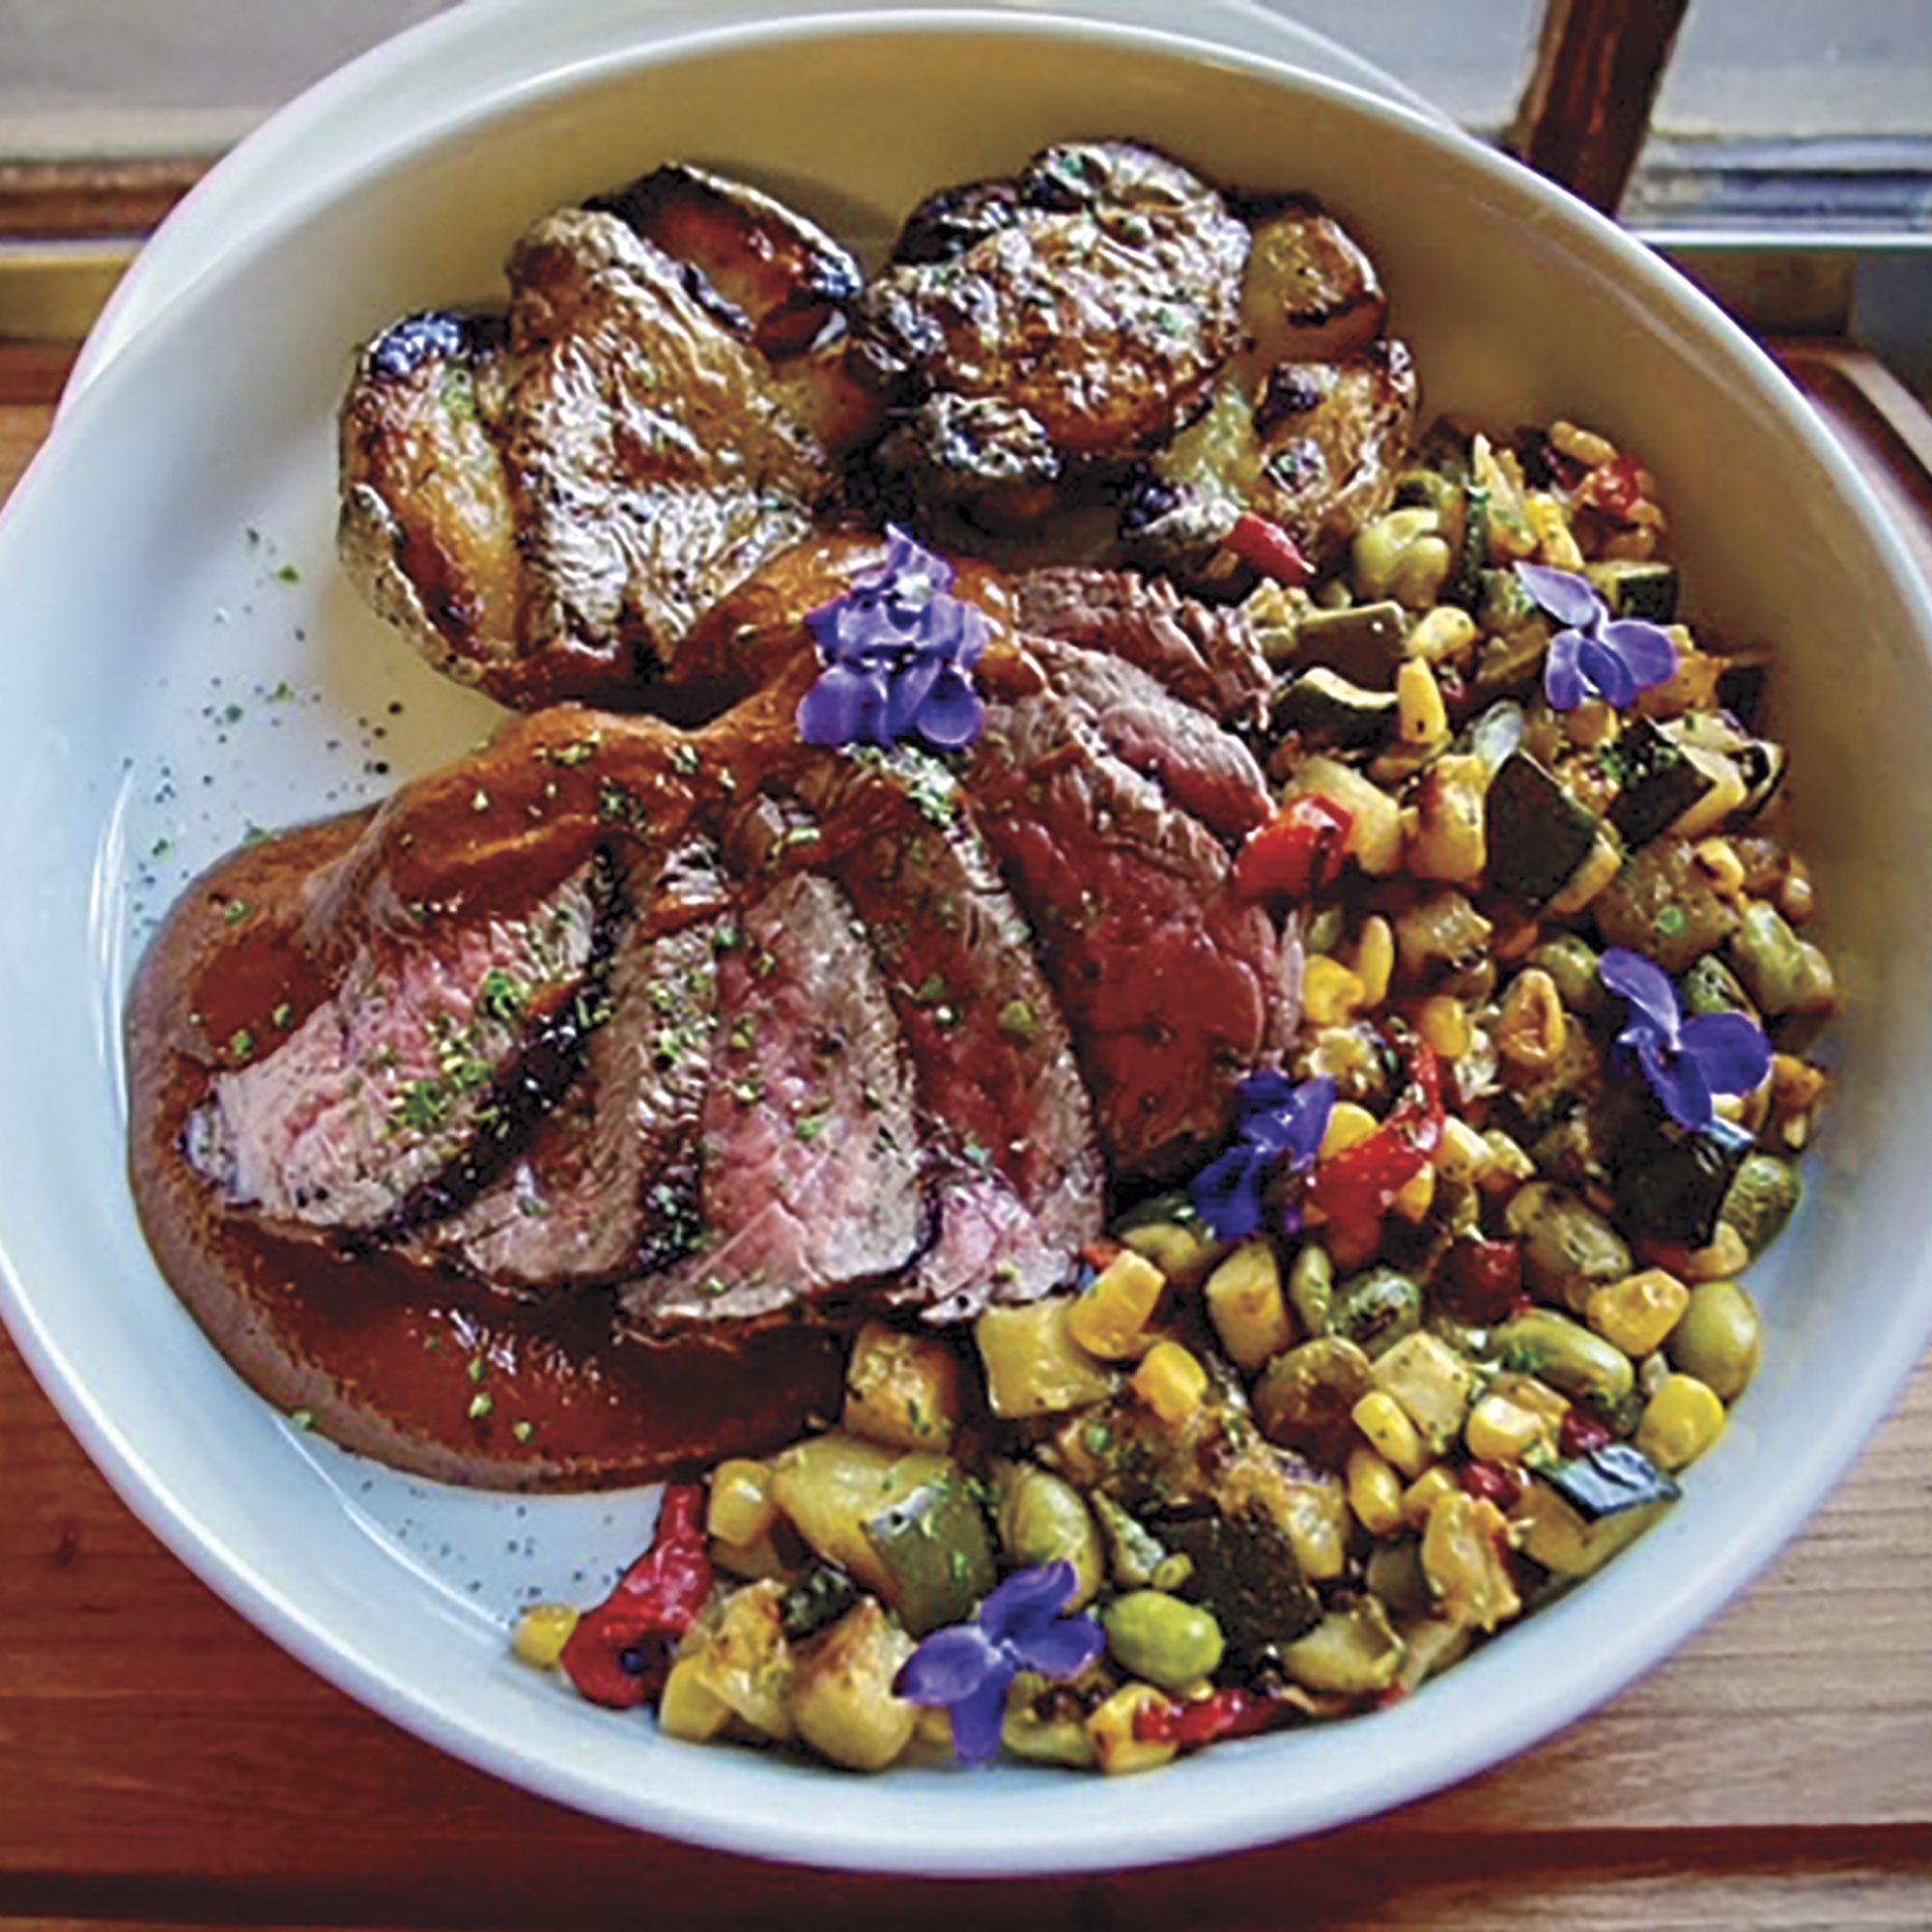 food at Orchard Canyon; Photo courtesy Orchard Canyon On Oak Creek